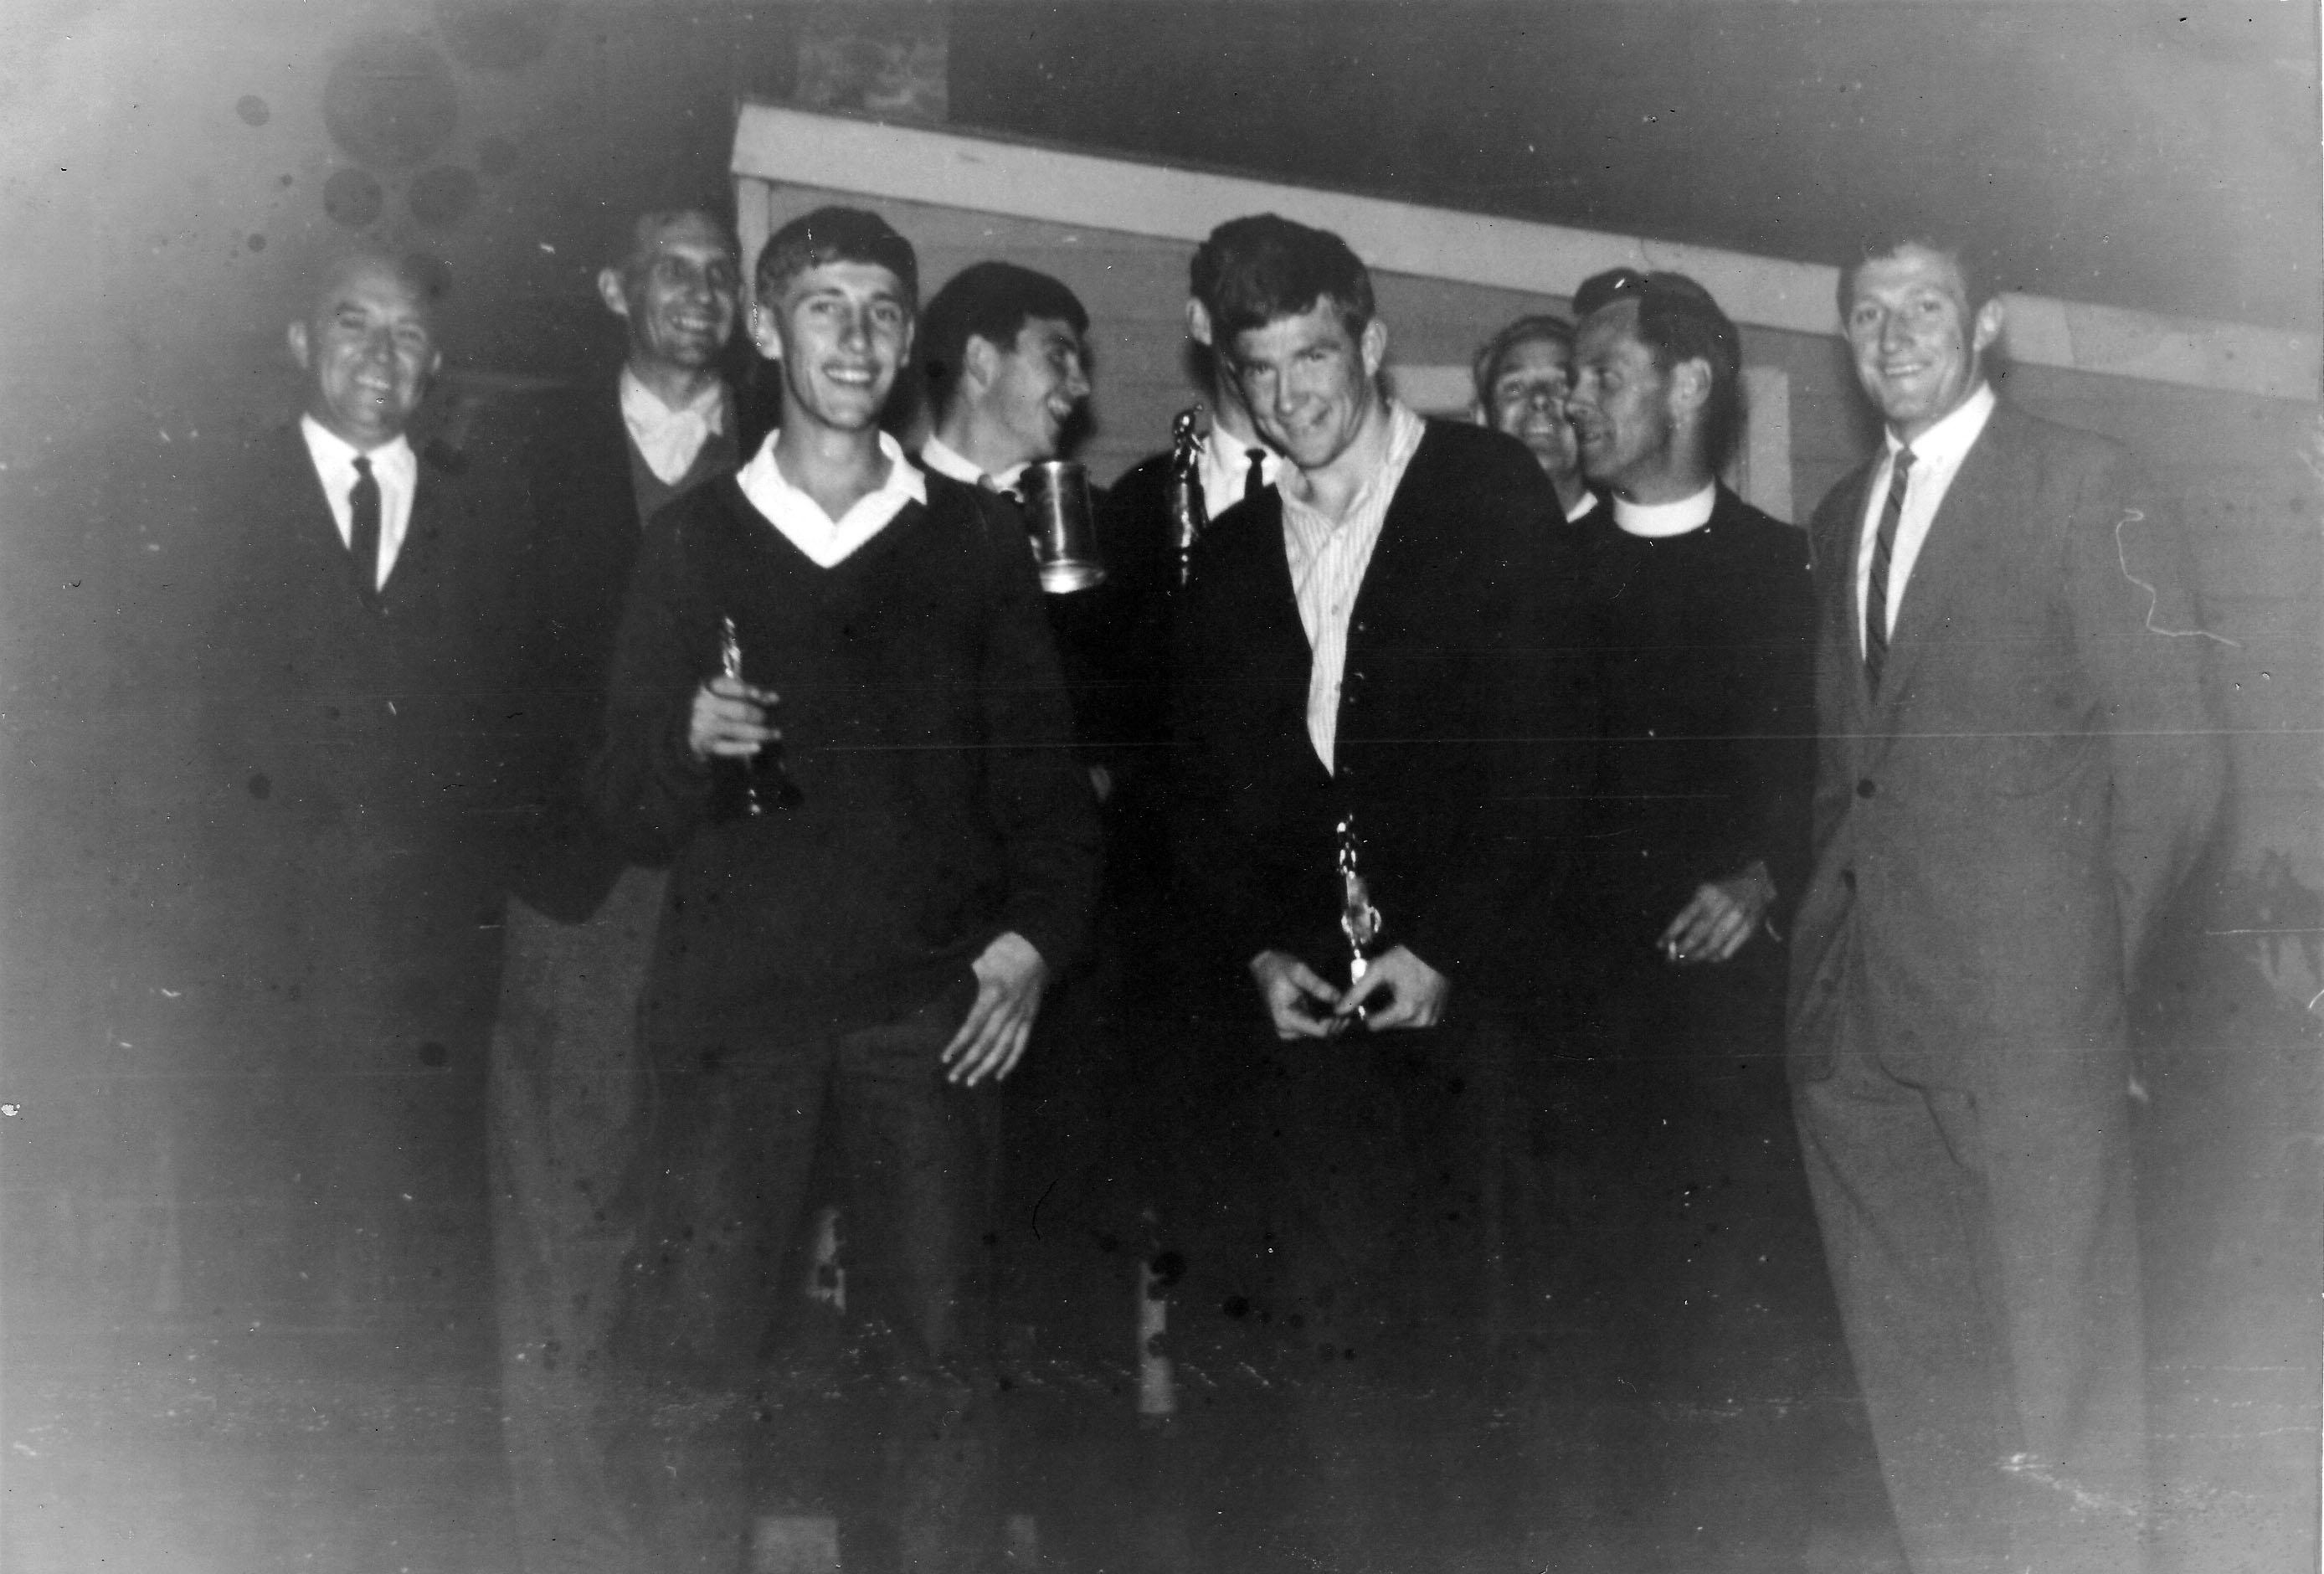 187. Highgate YCW Footballers 1965